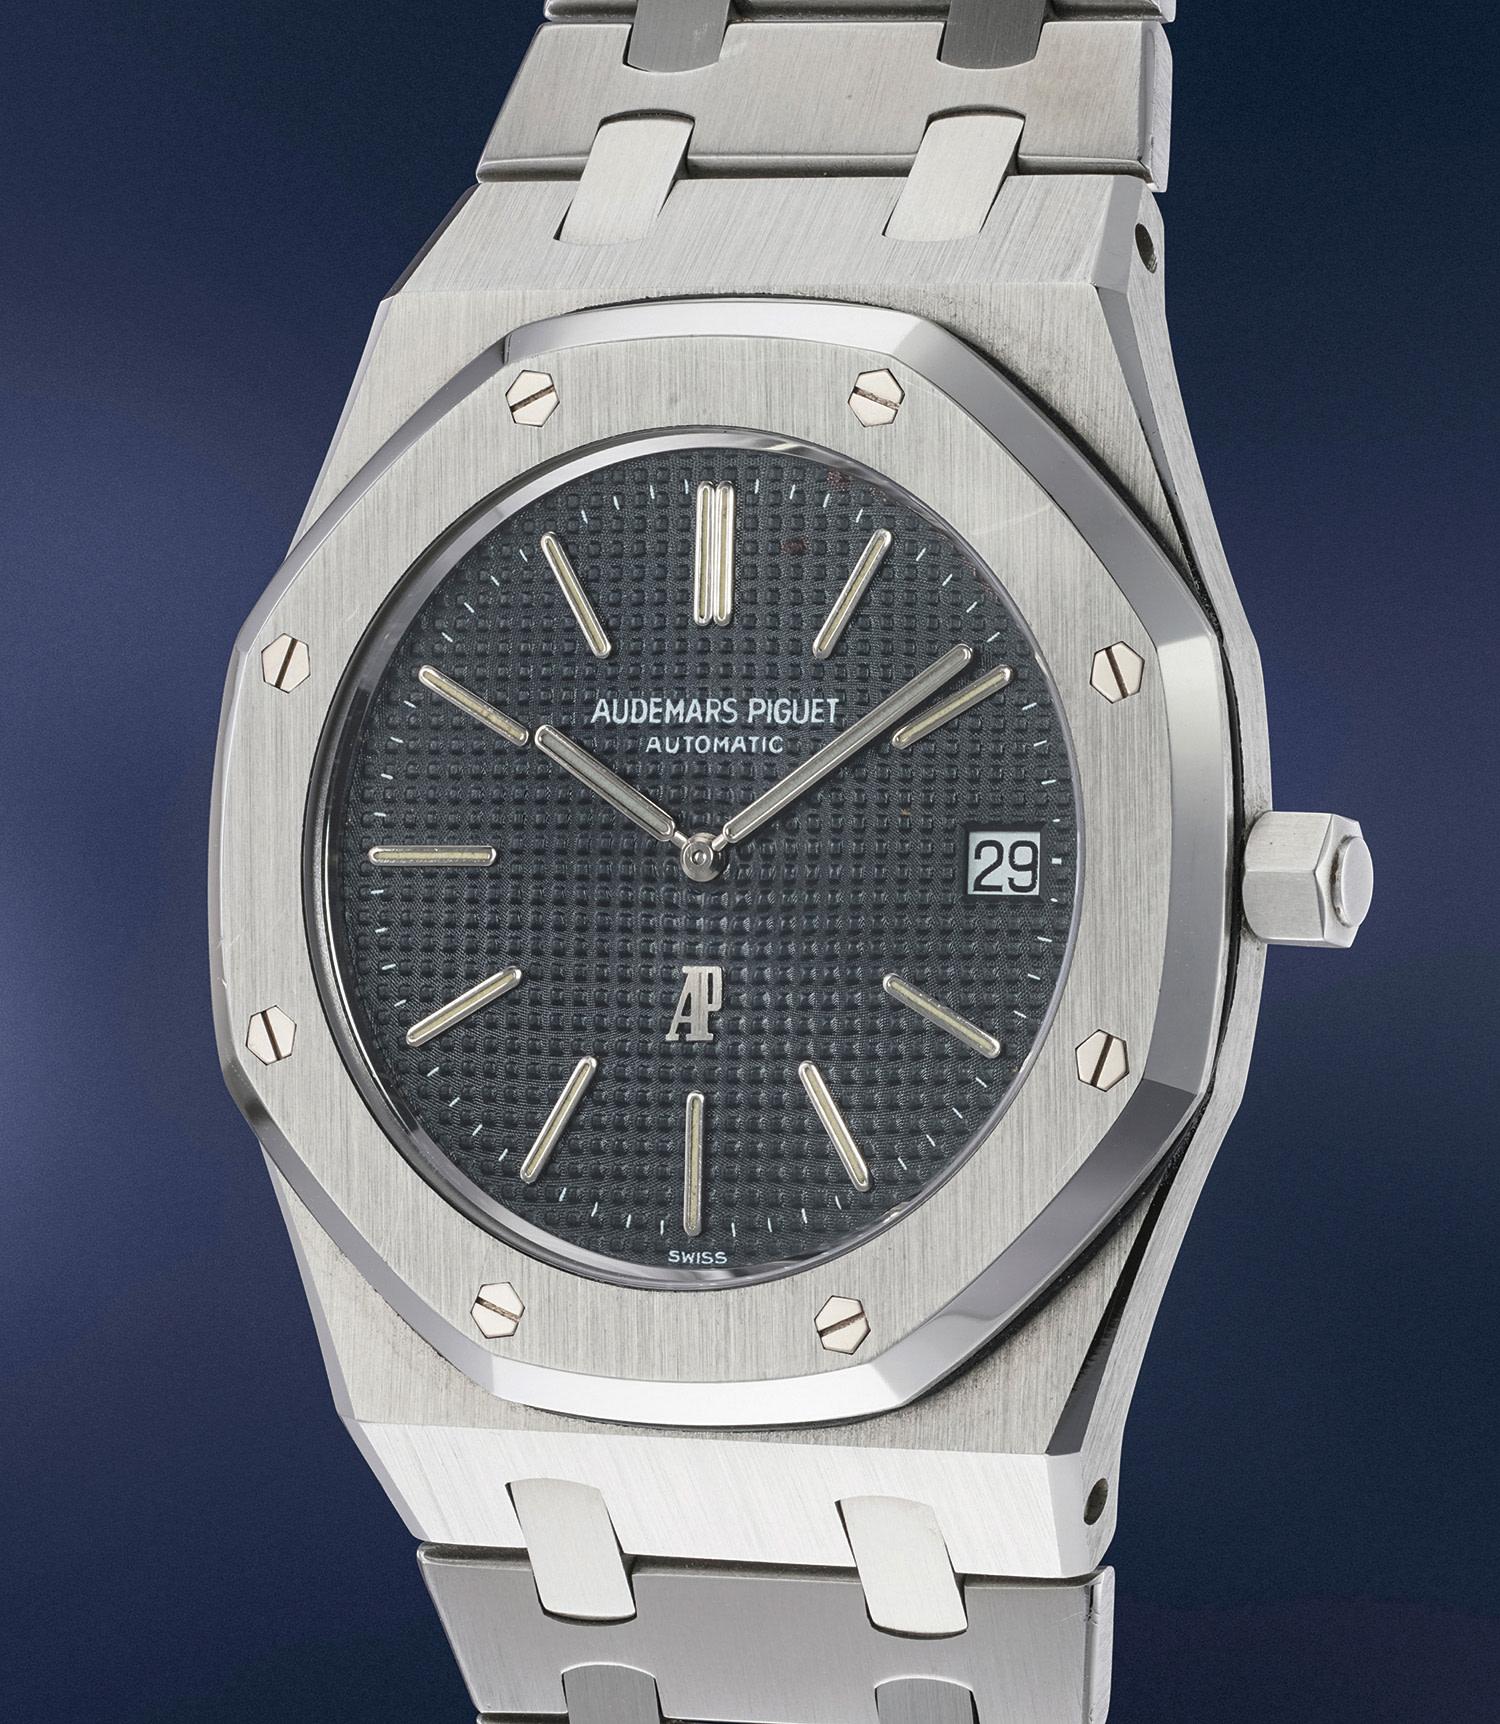 Phillips Geneva Watch Auction XIII